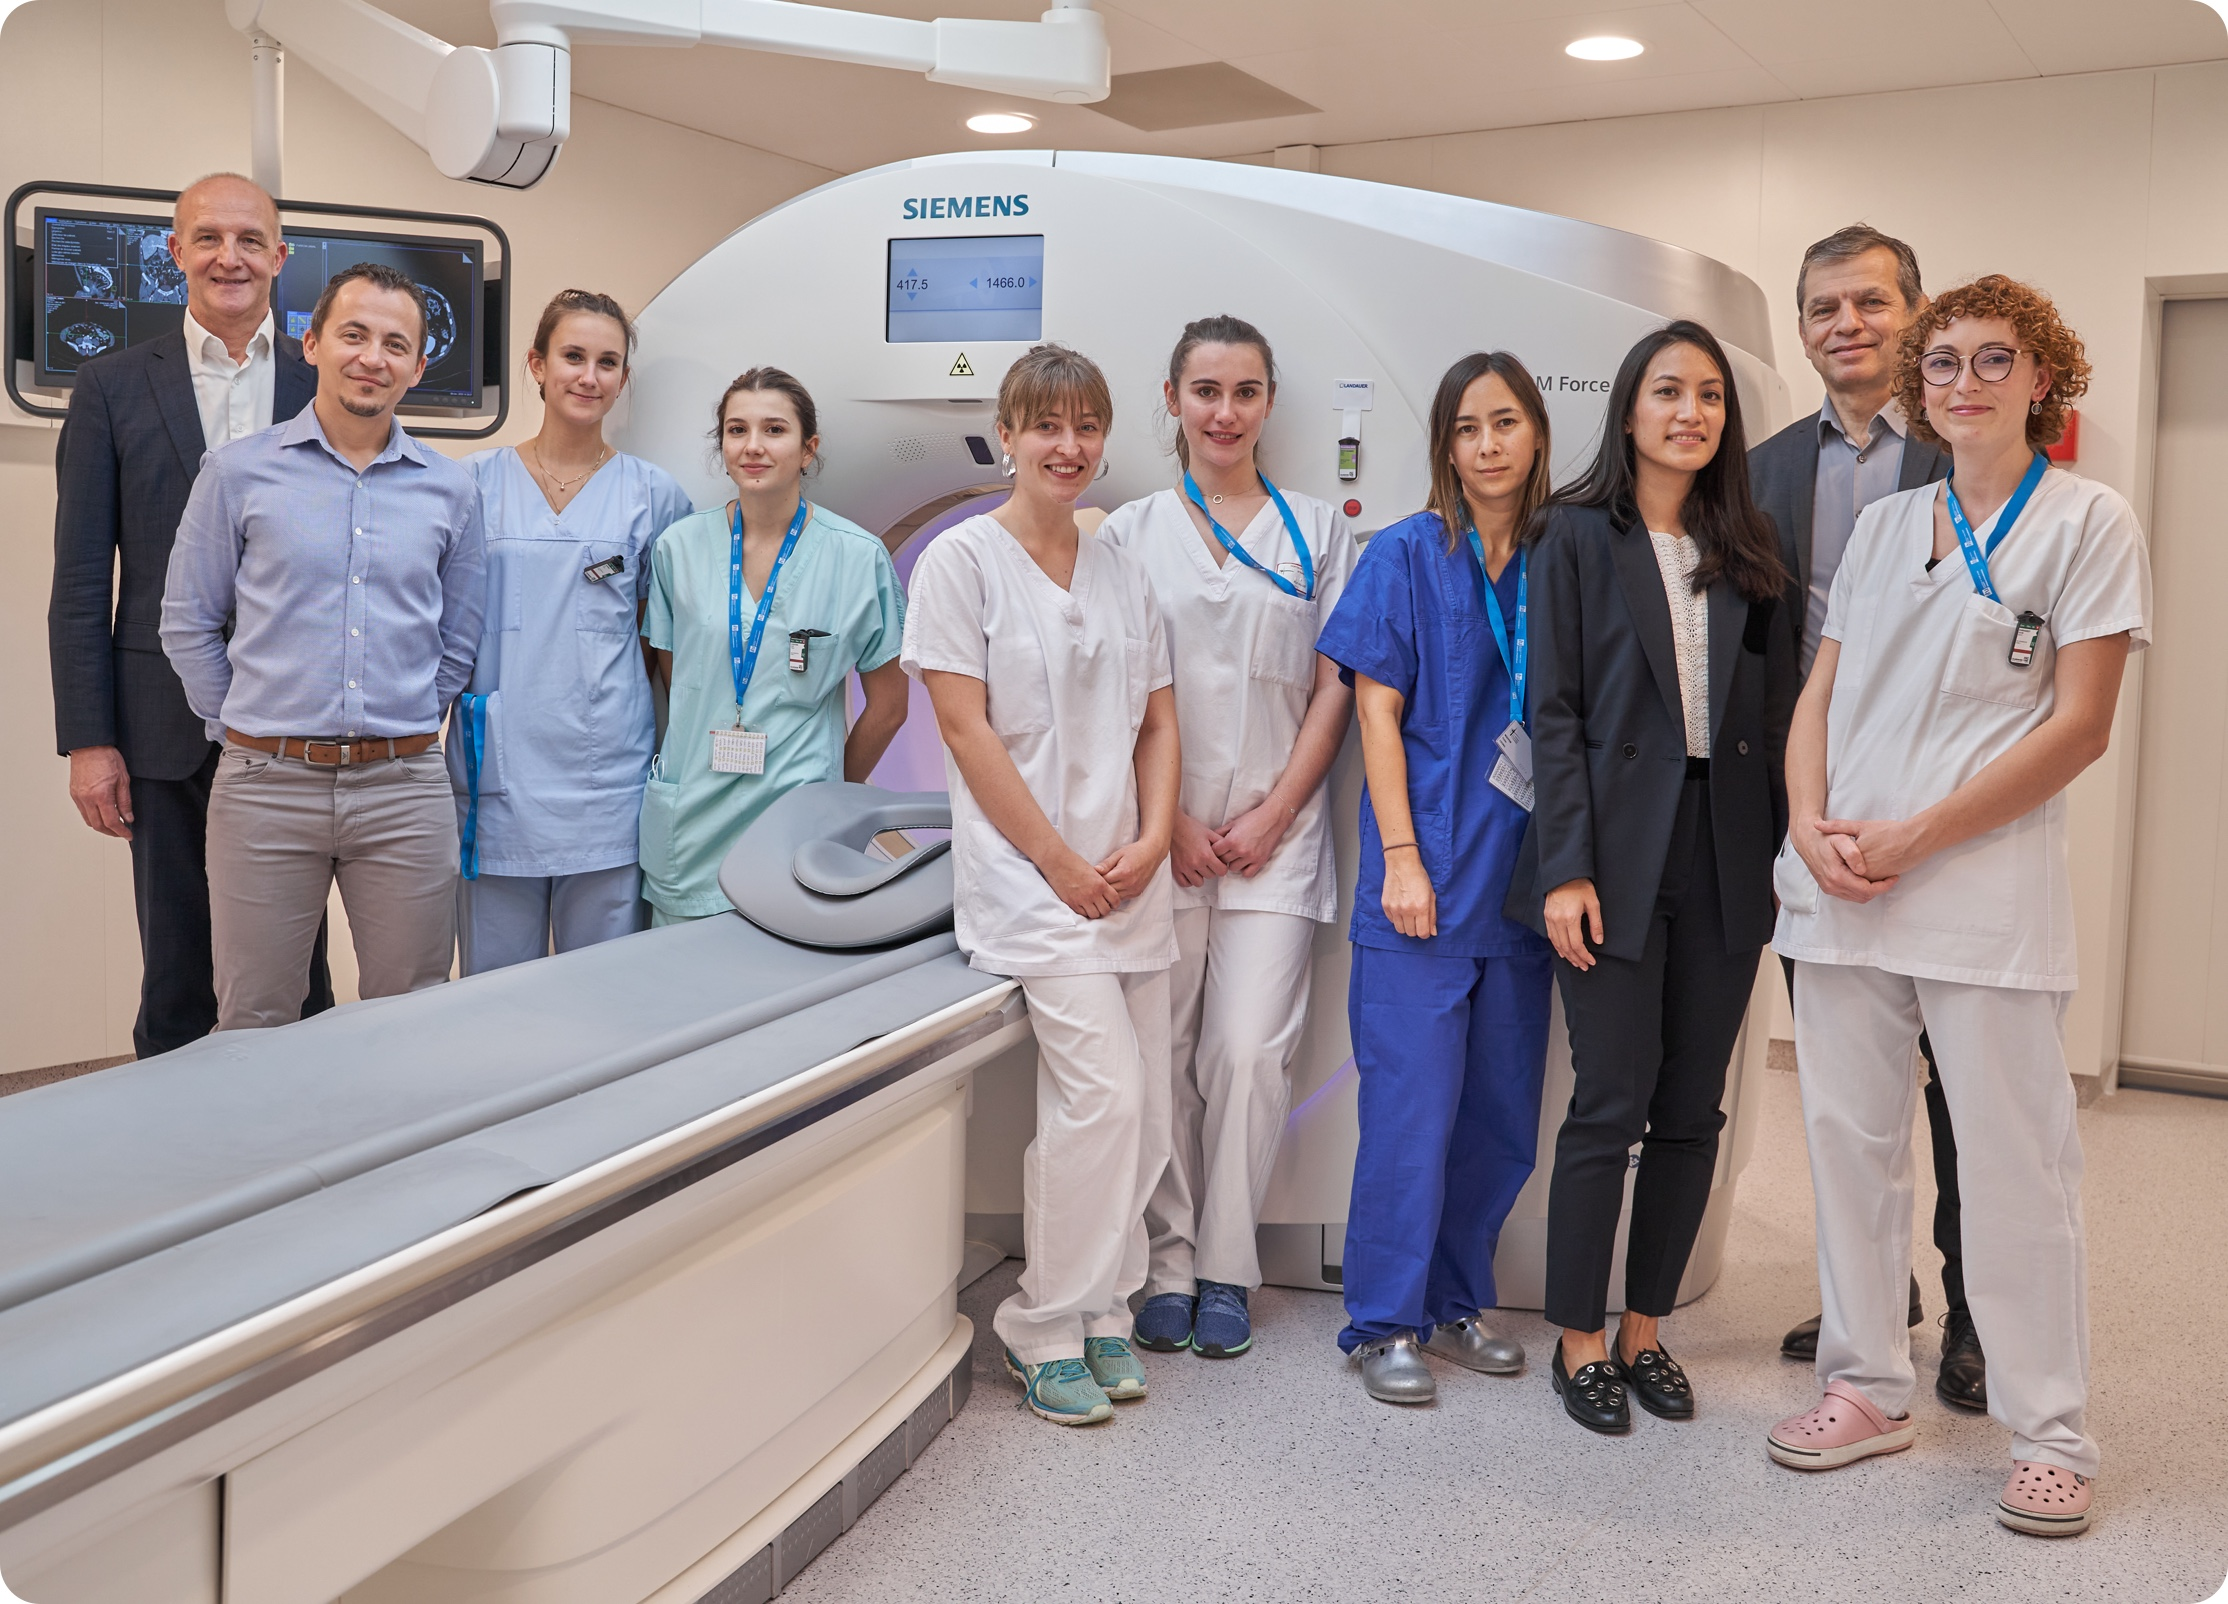 Équipe médicale centre d'imagerie - IHU Strasbourg